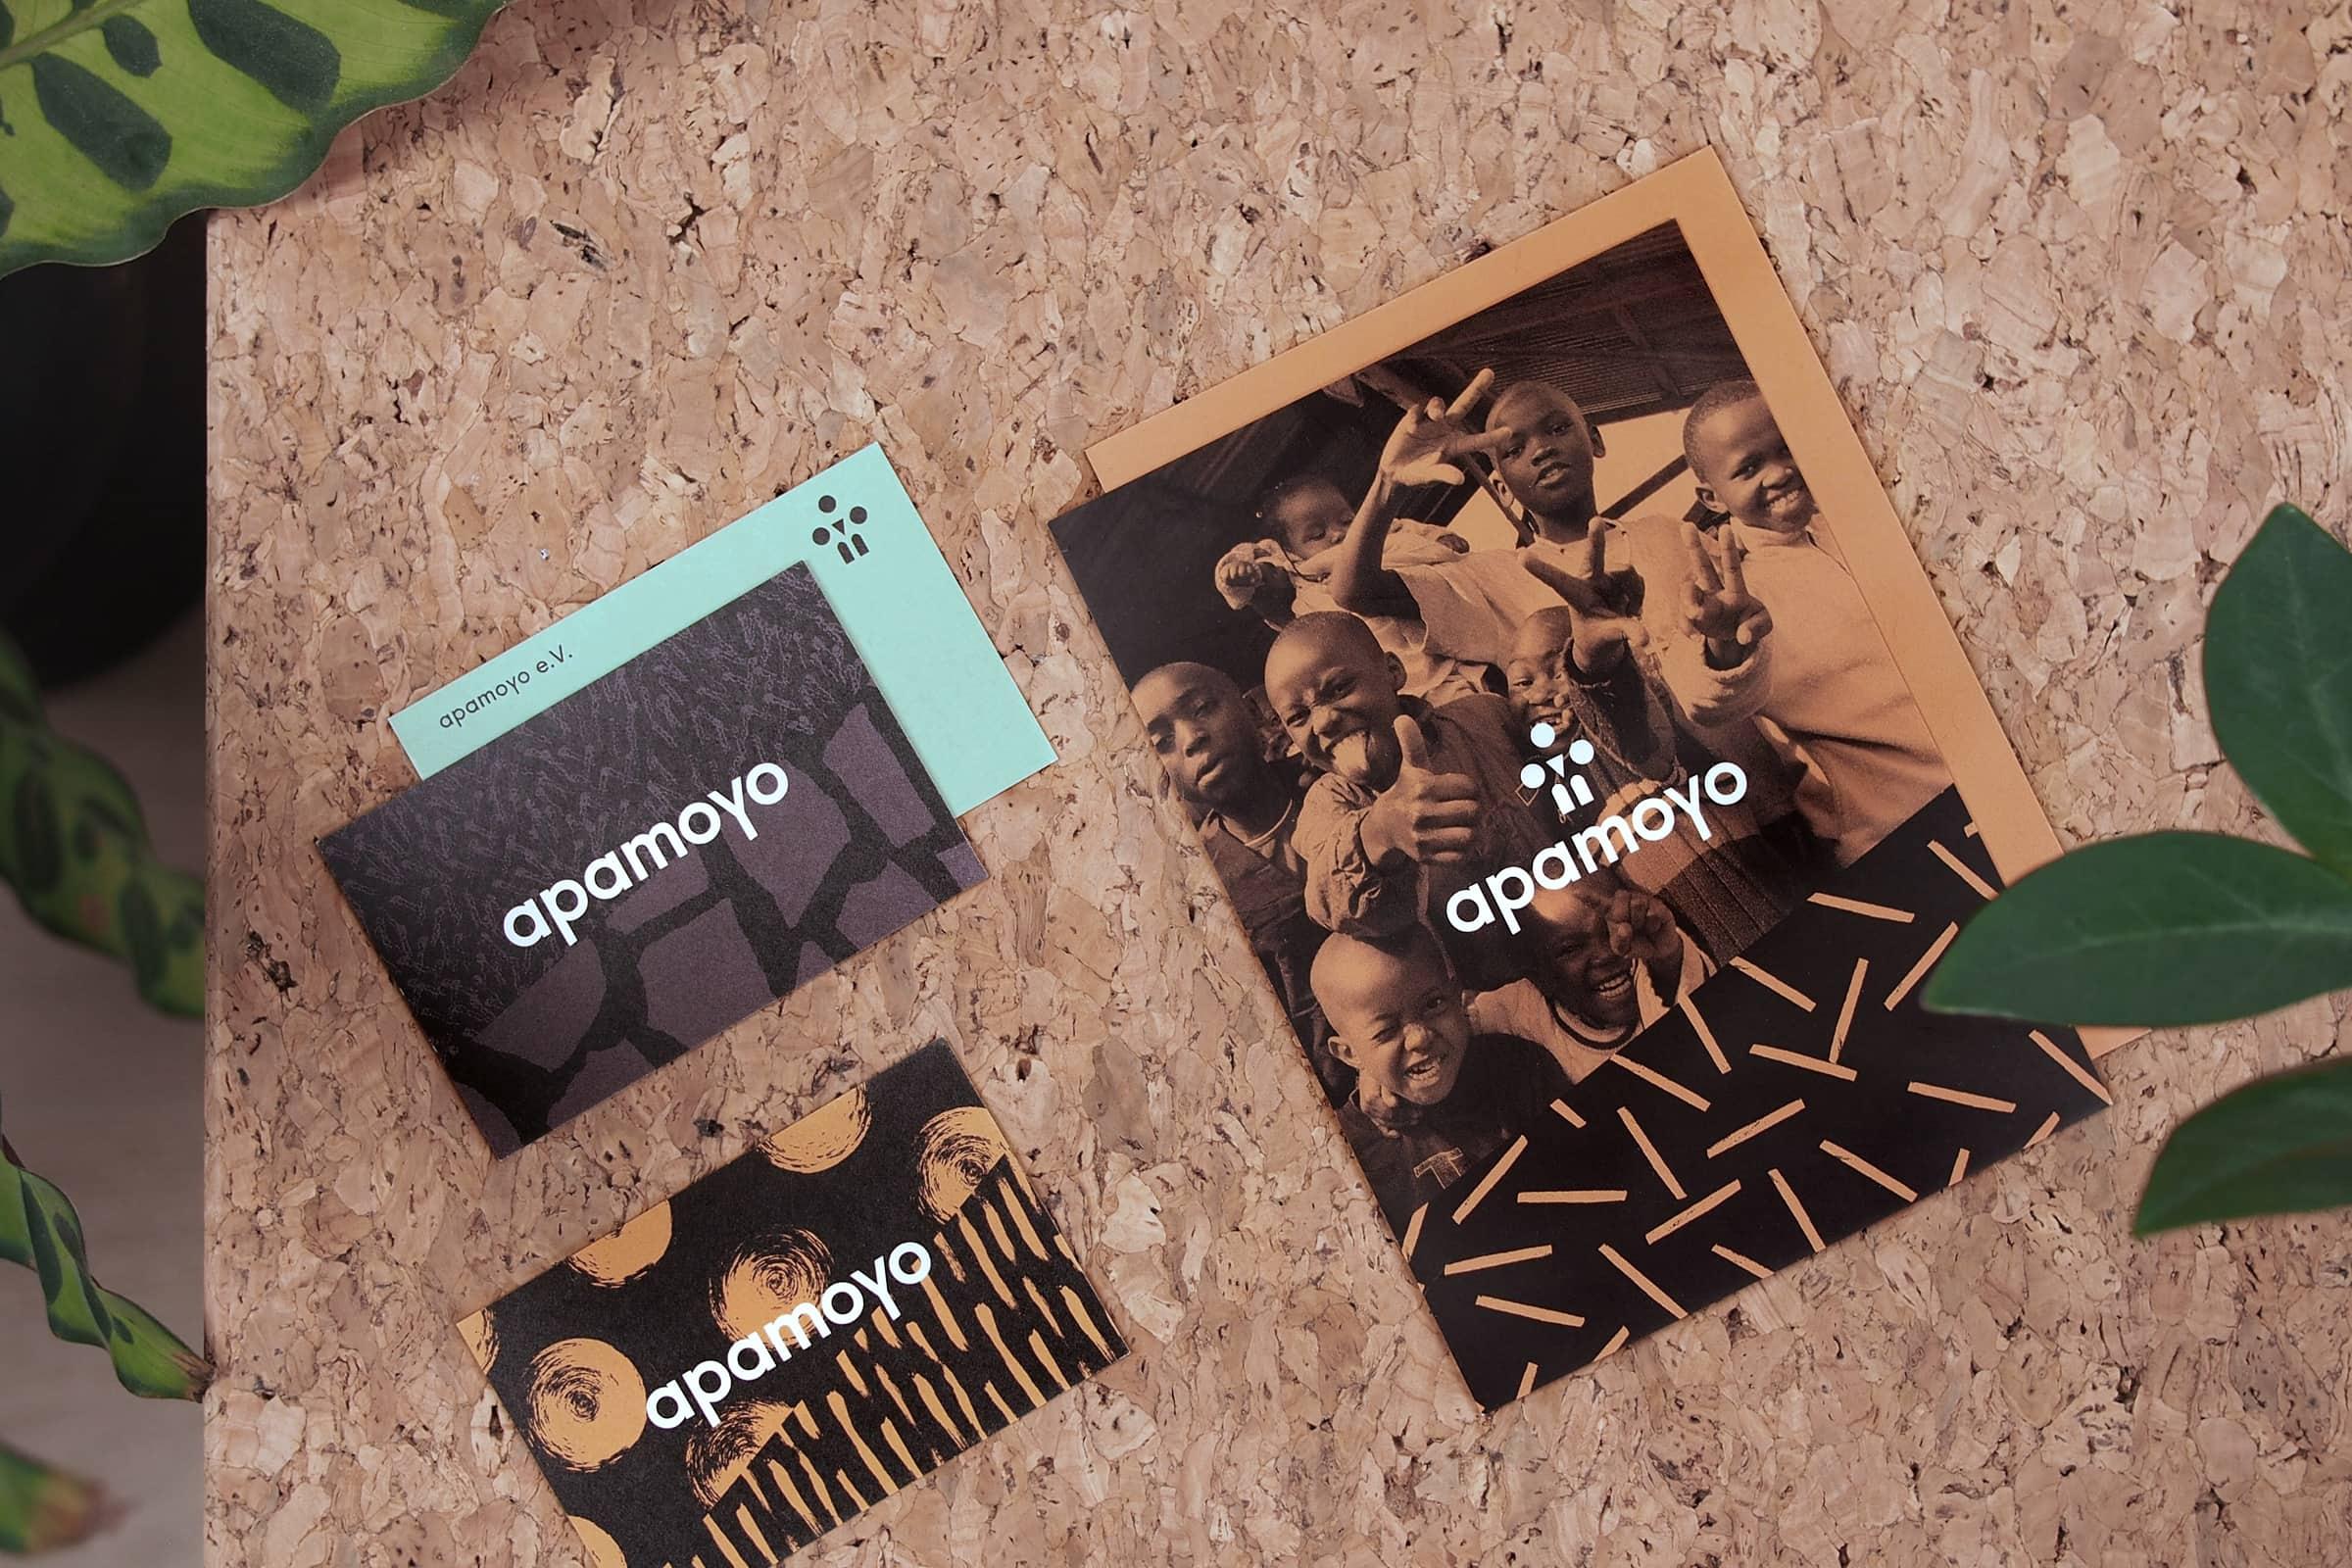 Visitenkarten, Flyer, Design, Muster, Hilfsorganisation